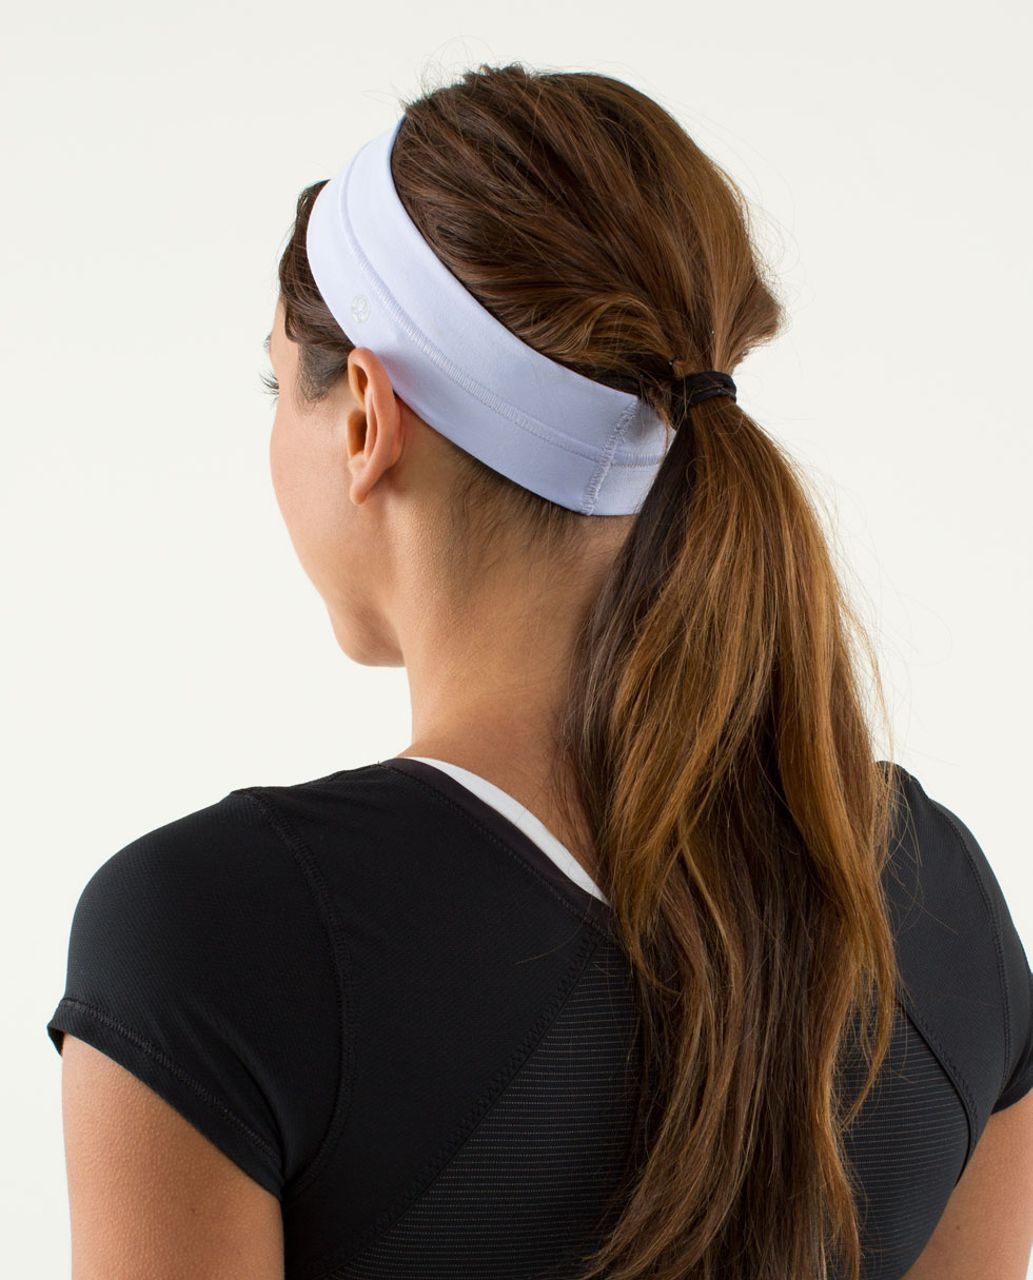 Lululemon Fly Away Tamer Headband - Cool Breeze